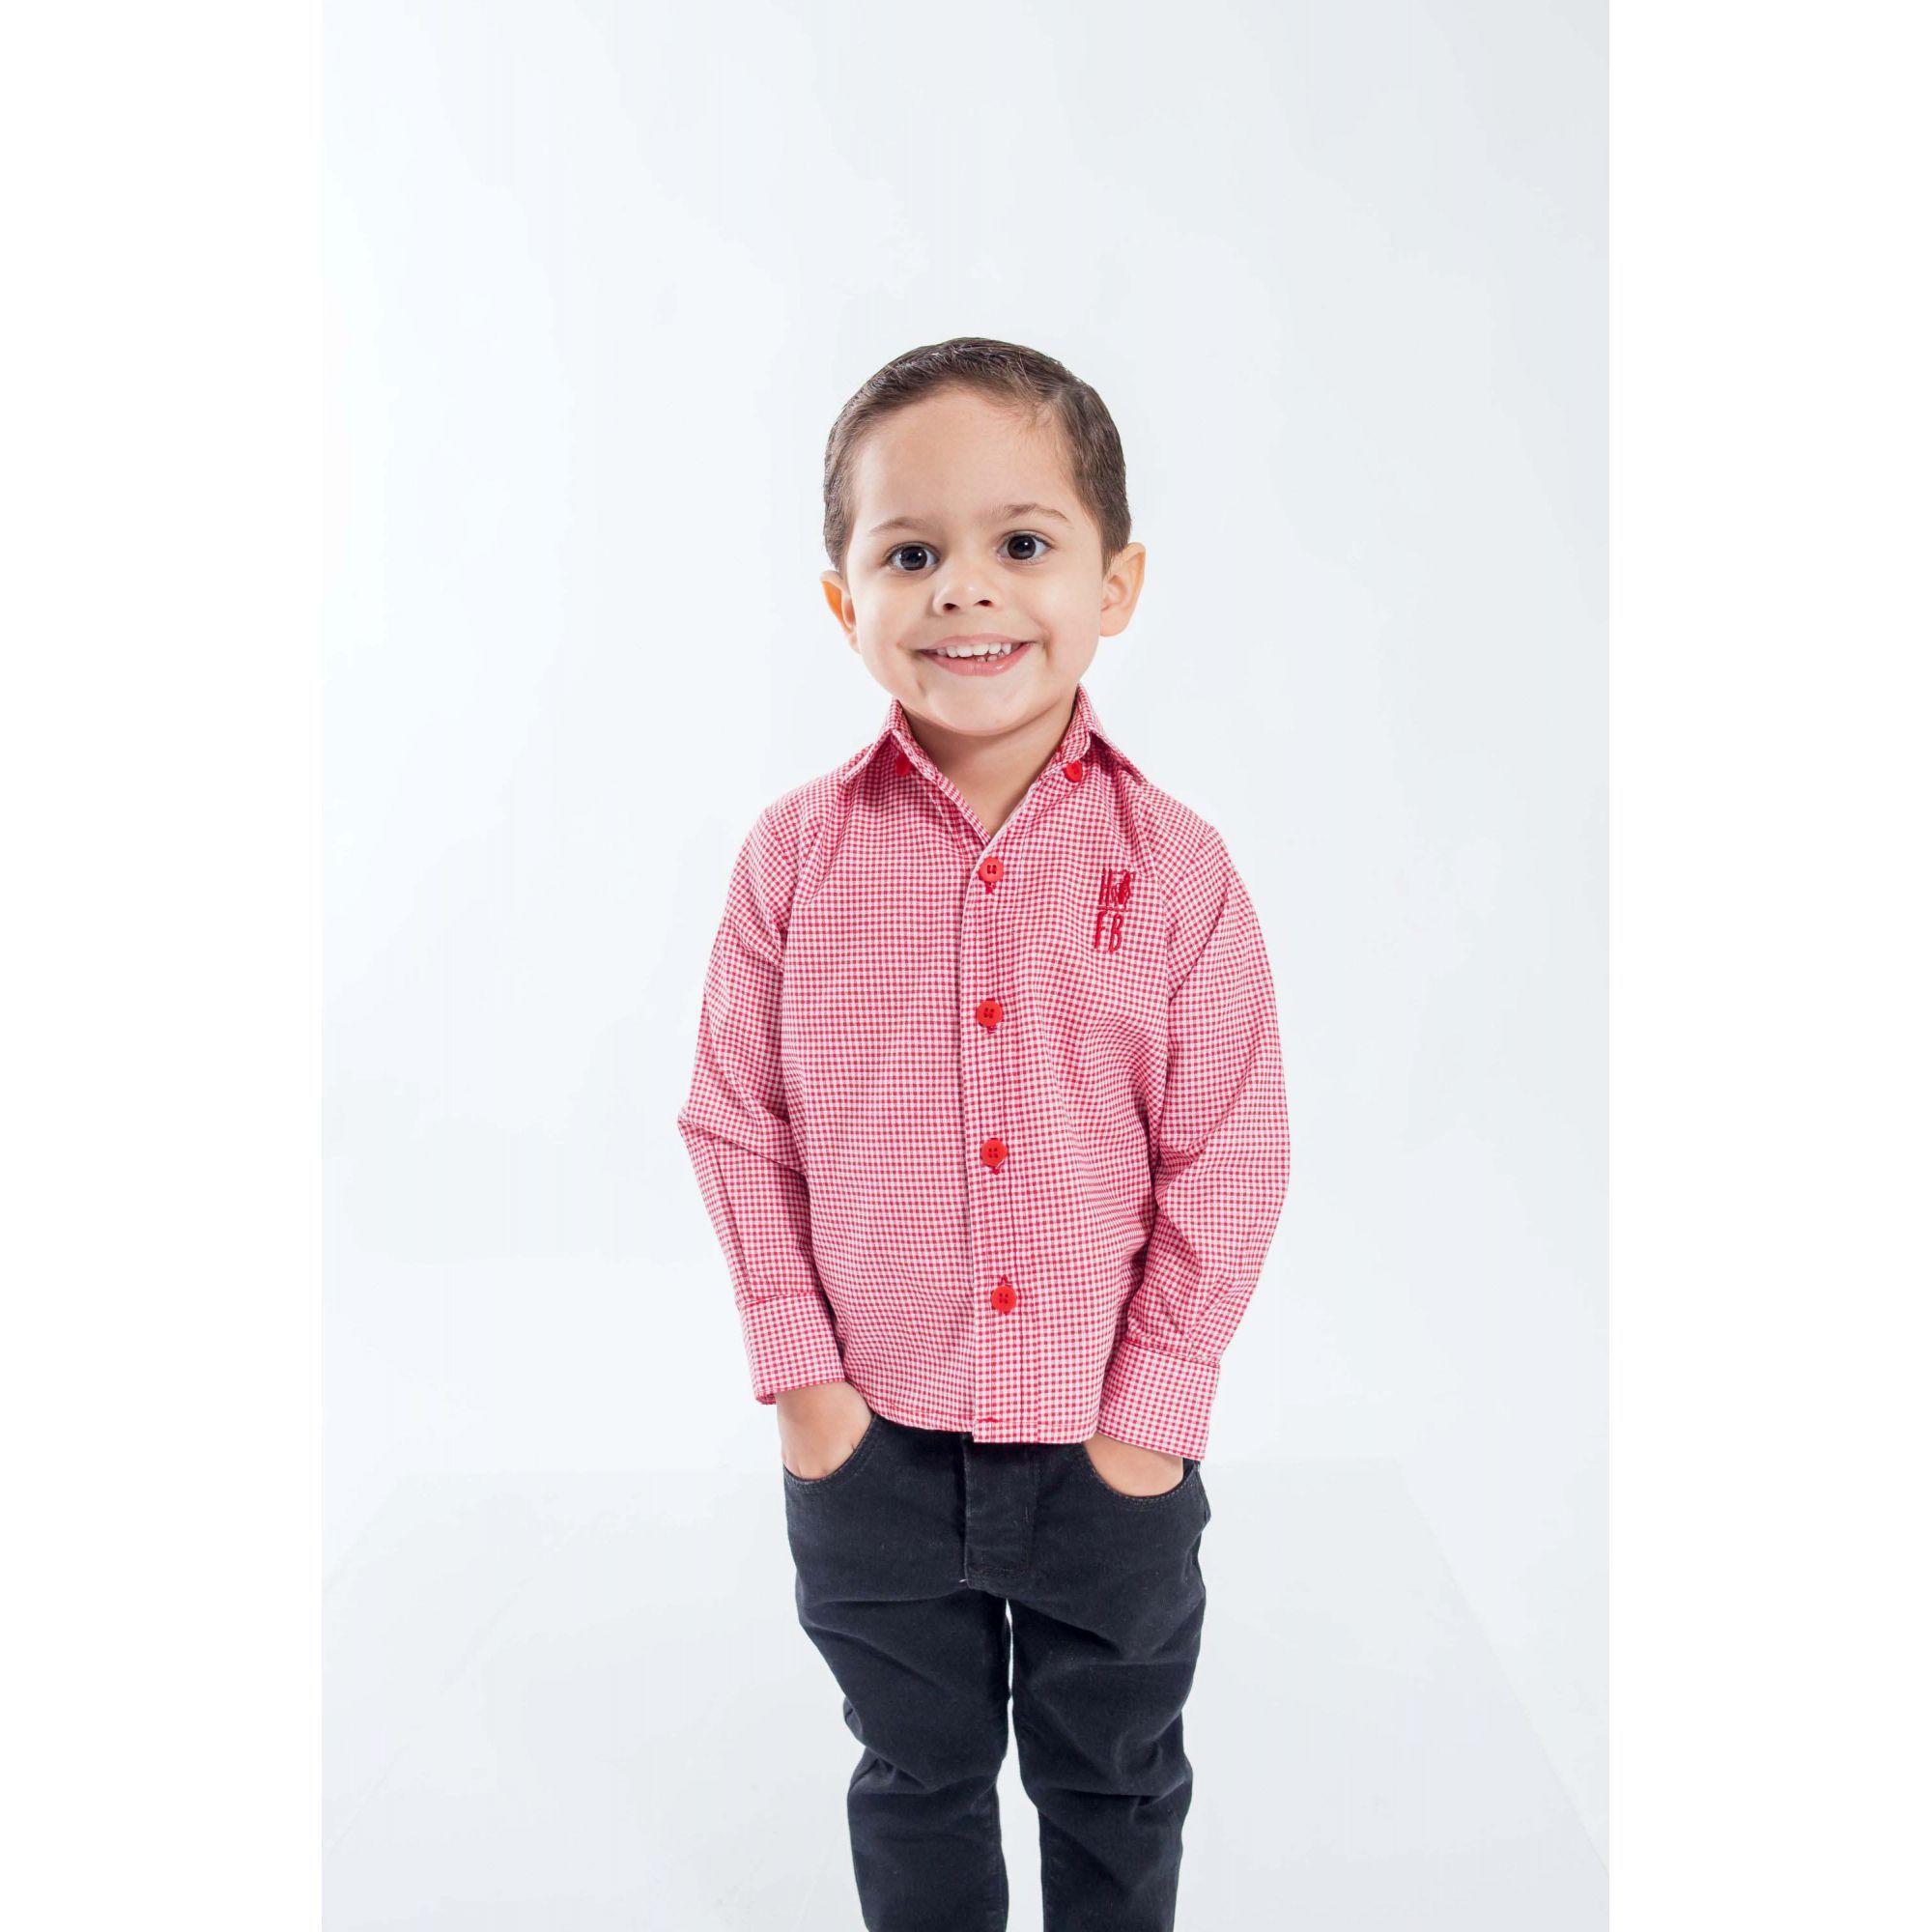 Camisa Social Jackie Chan Vermelha Infantil  - Heitor Fashion Brazil